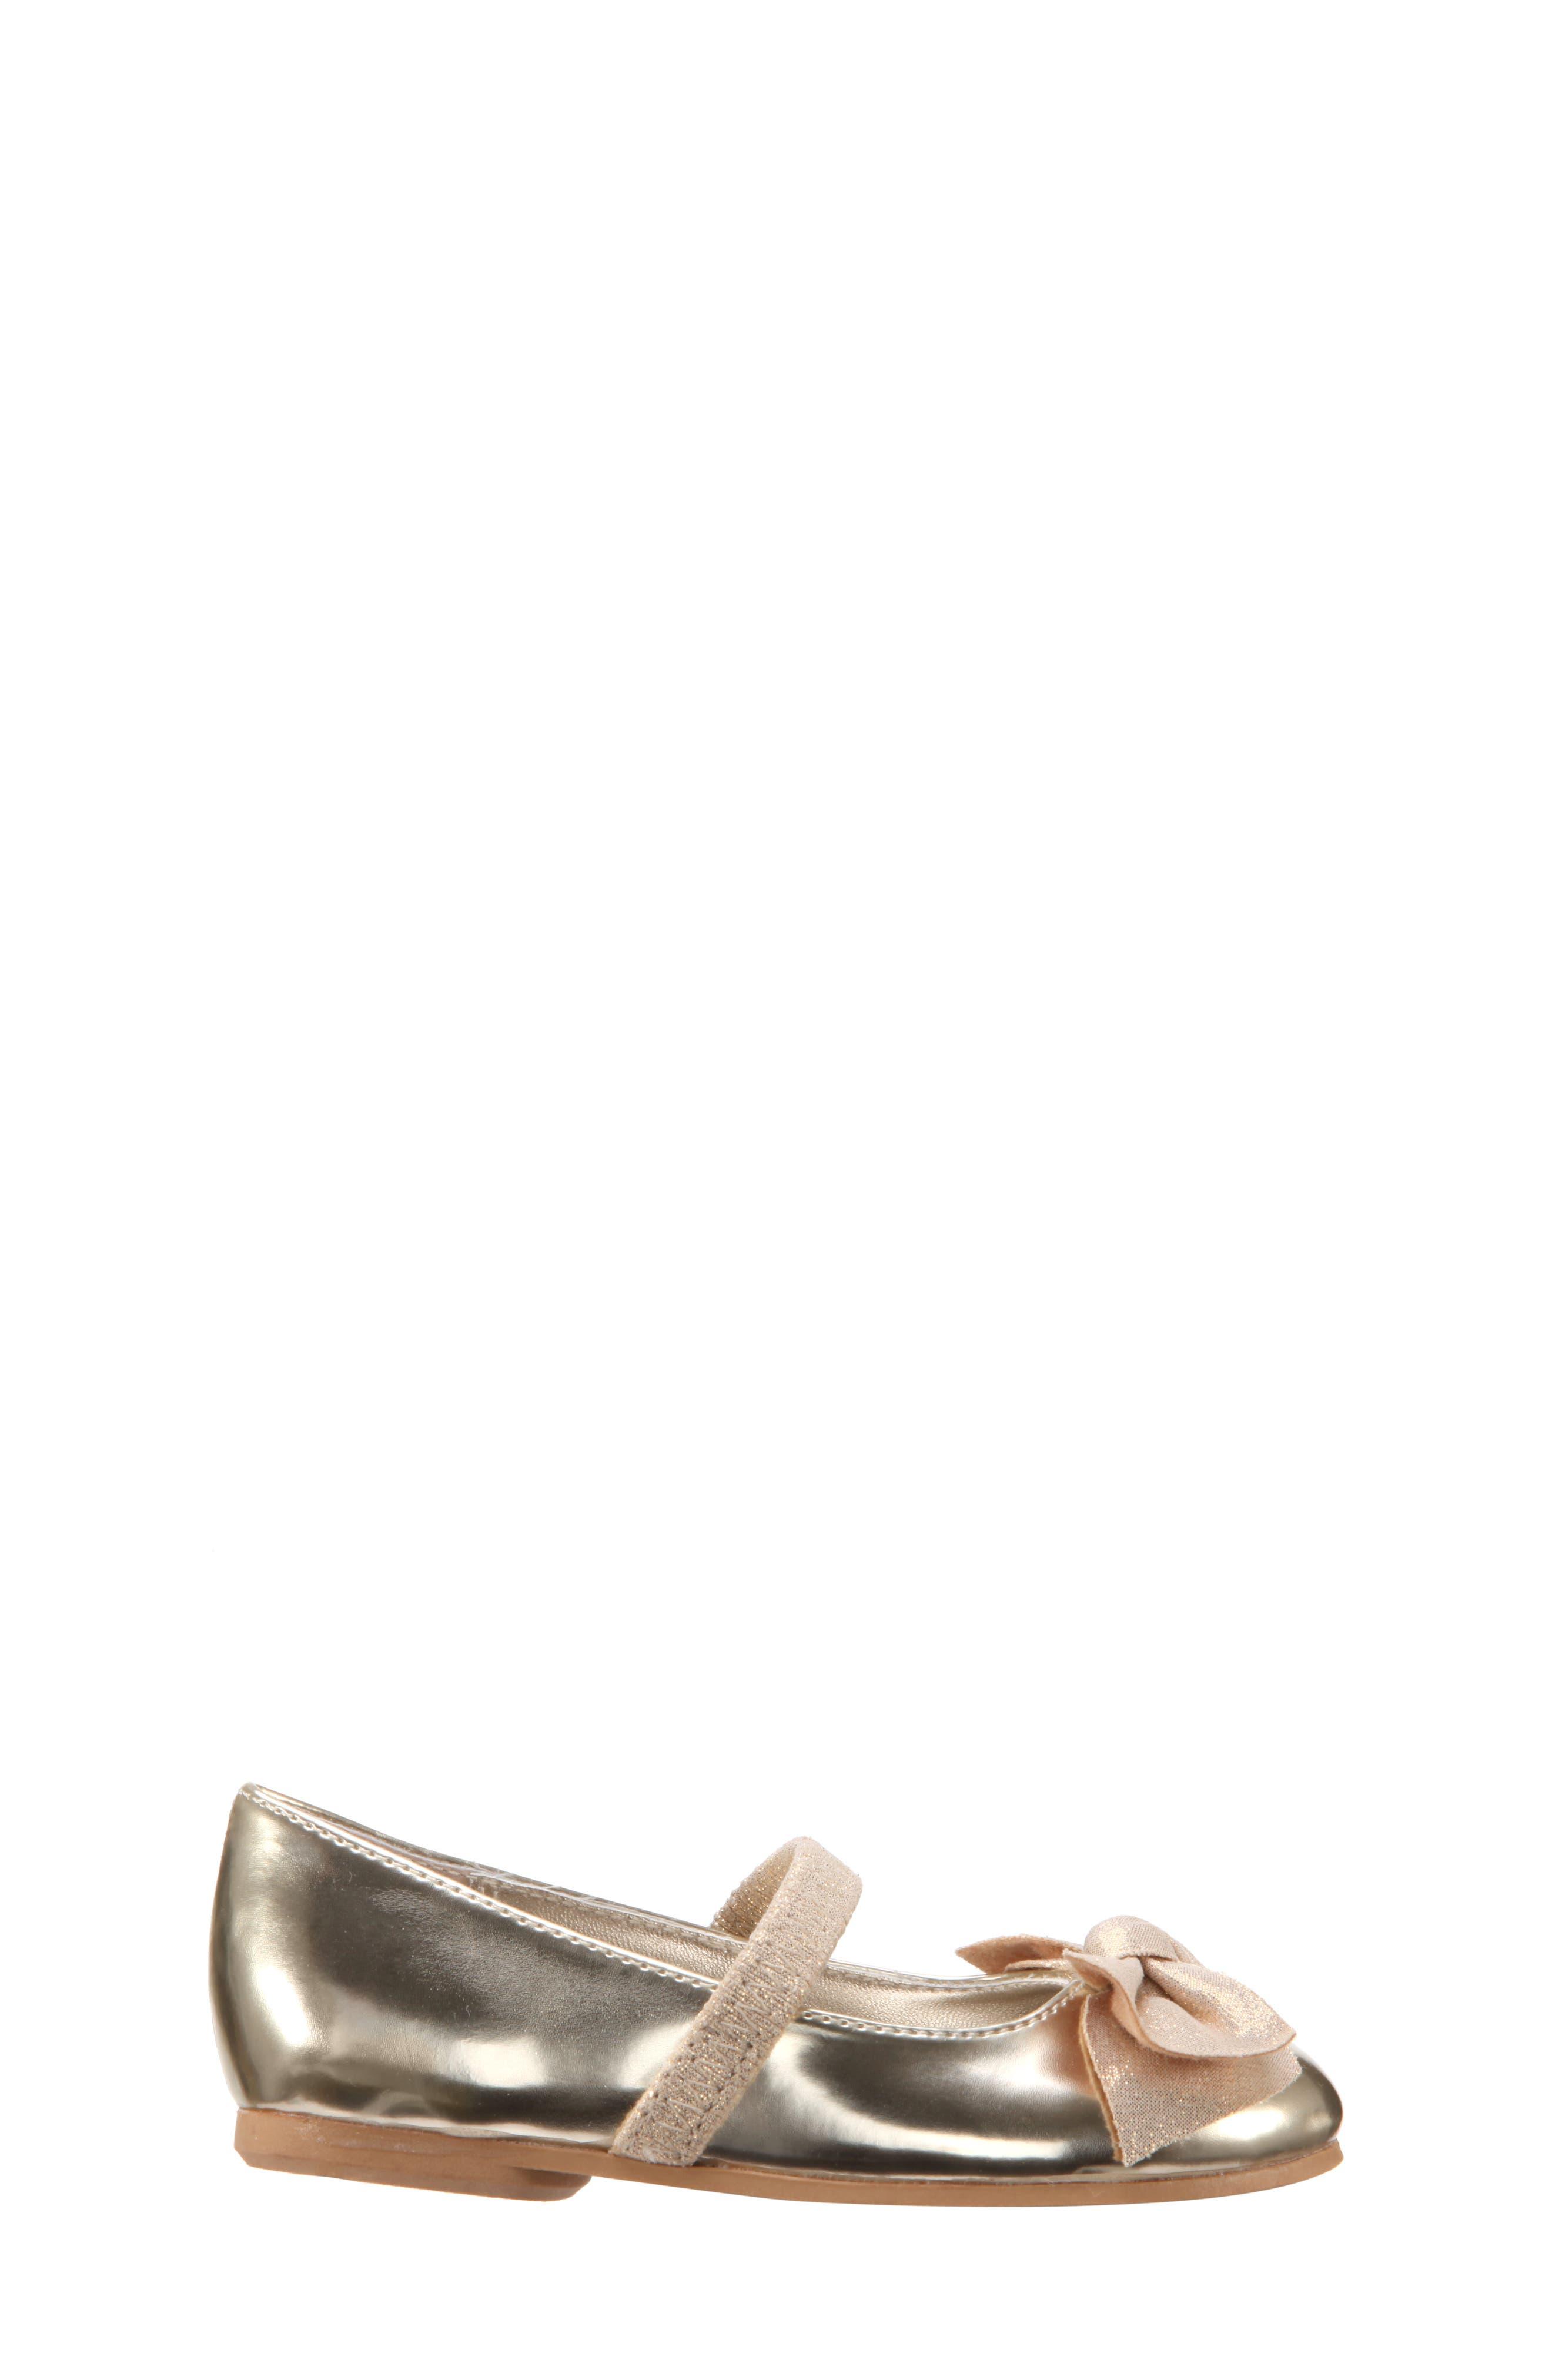 Kaytelyn-T Glitter Bow Ballet Flat,                             Alternate thumbnail 20, color,